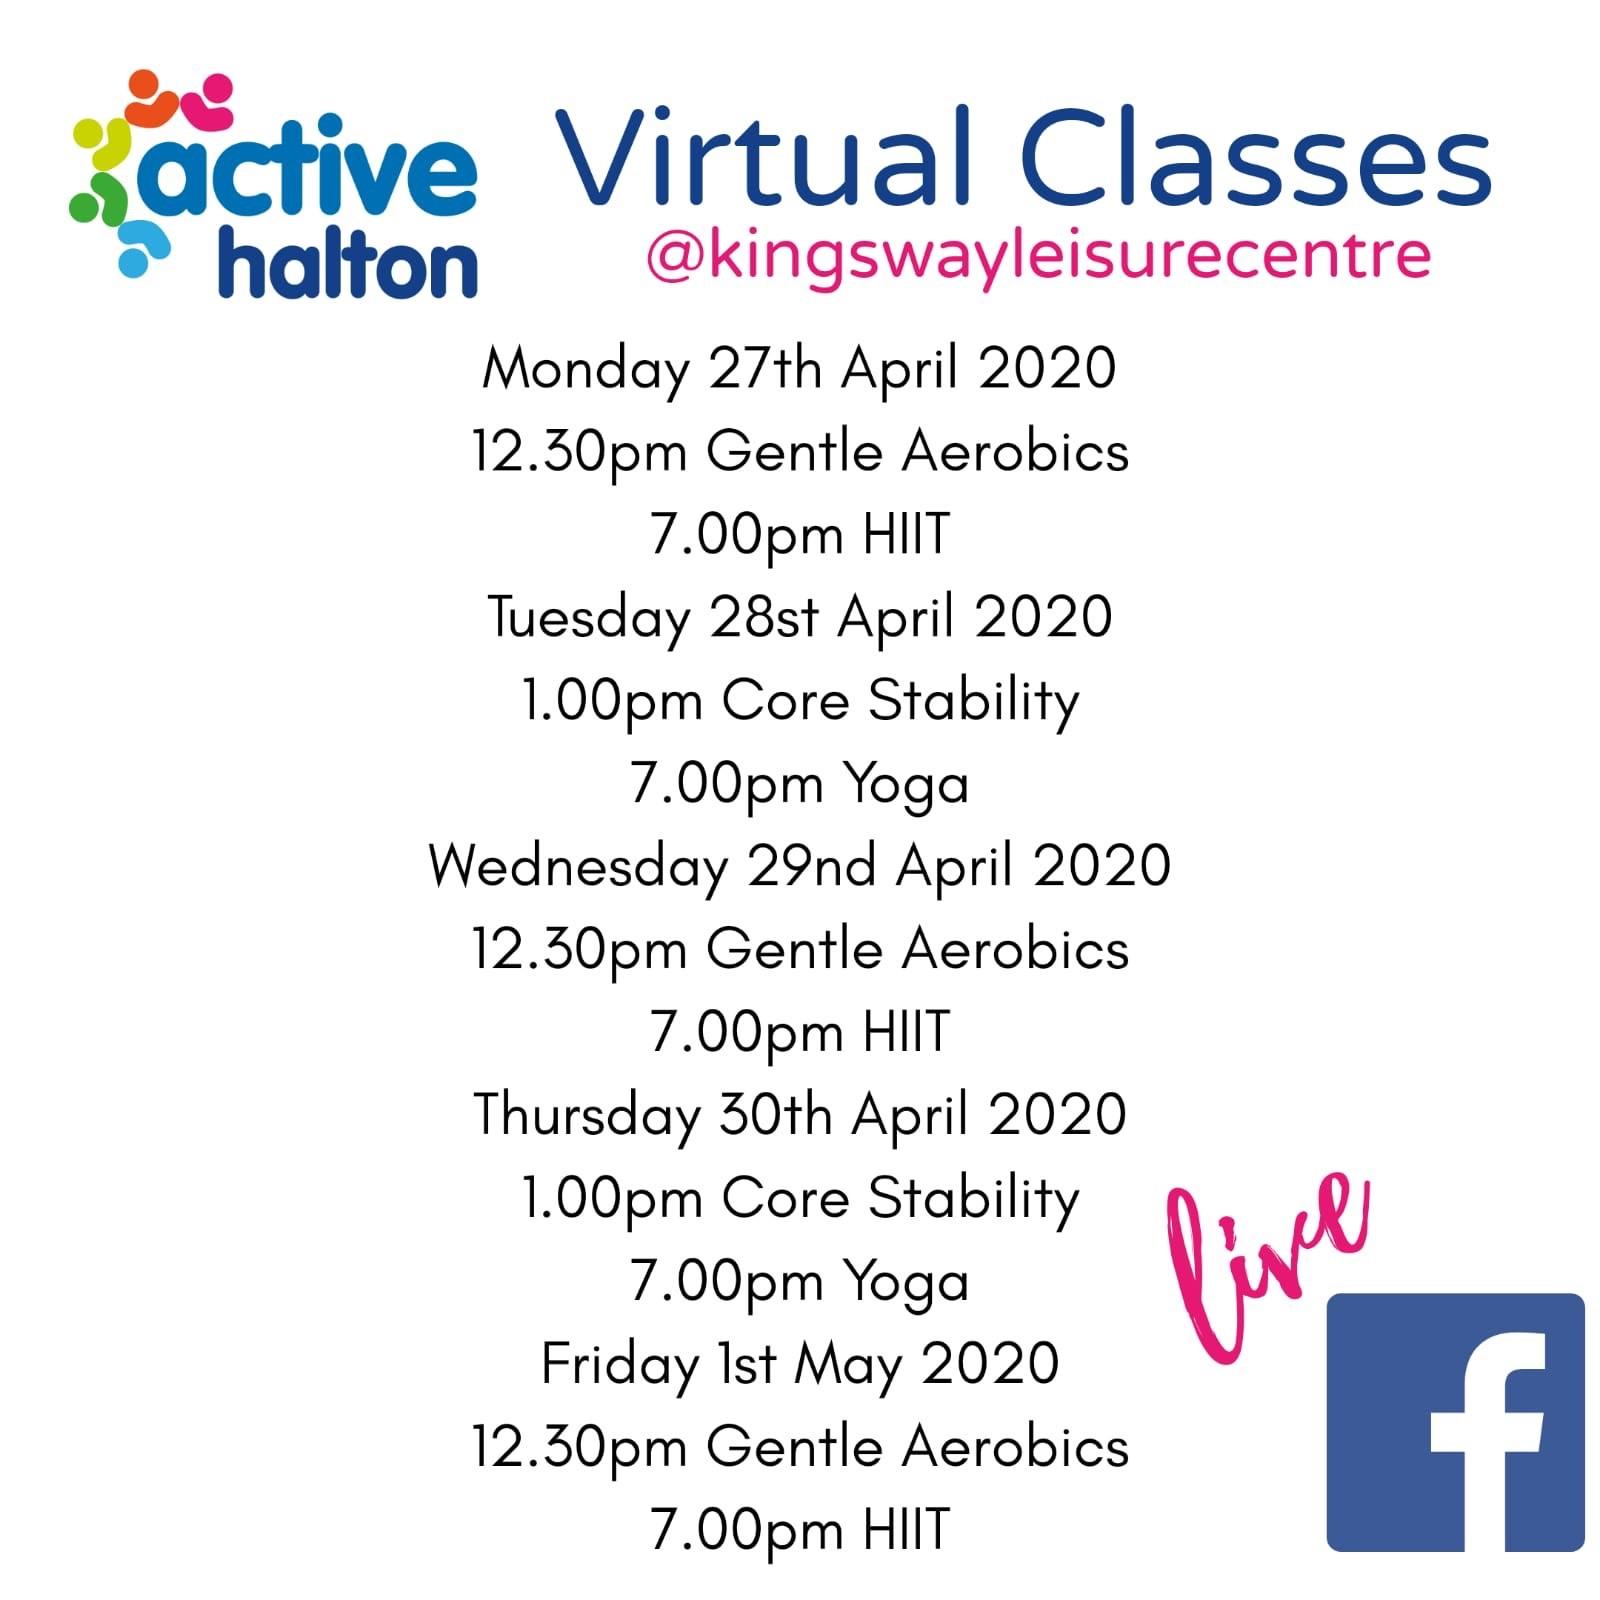 Active Halton virtual classes